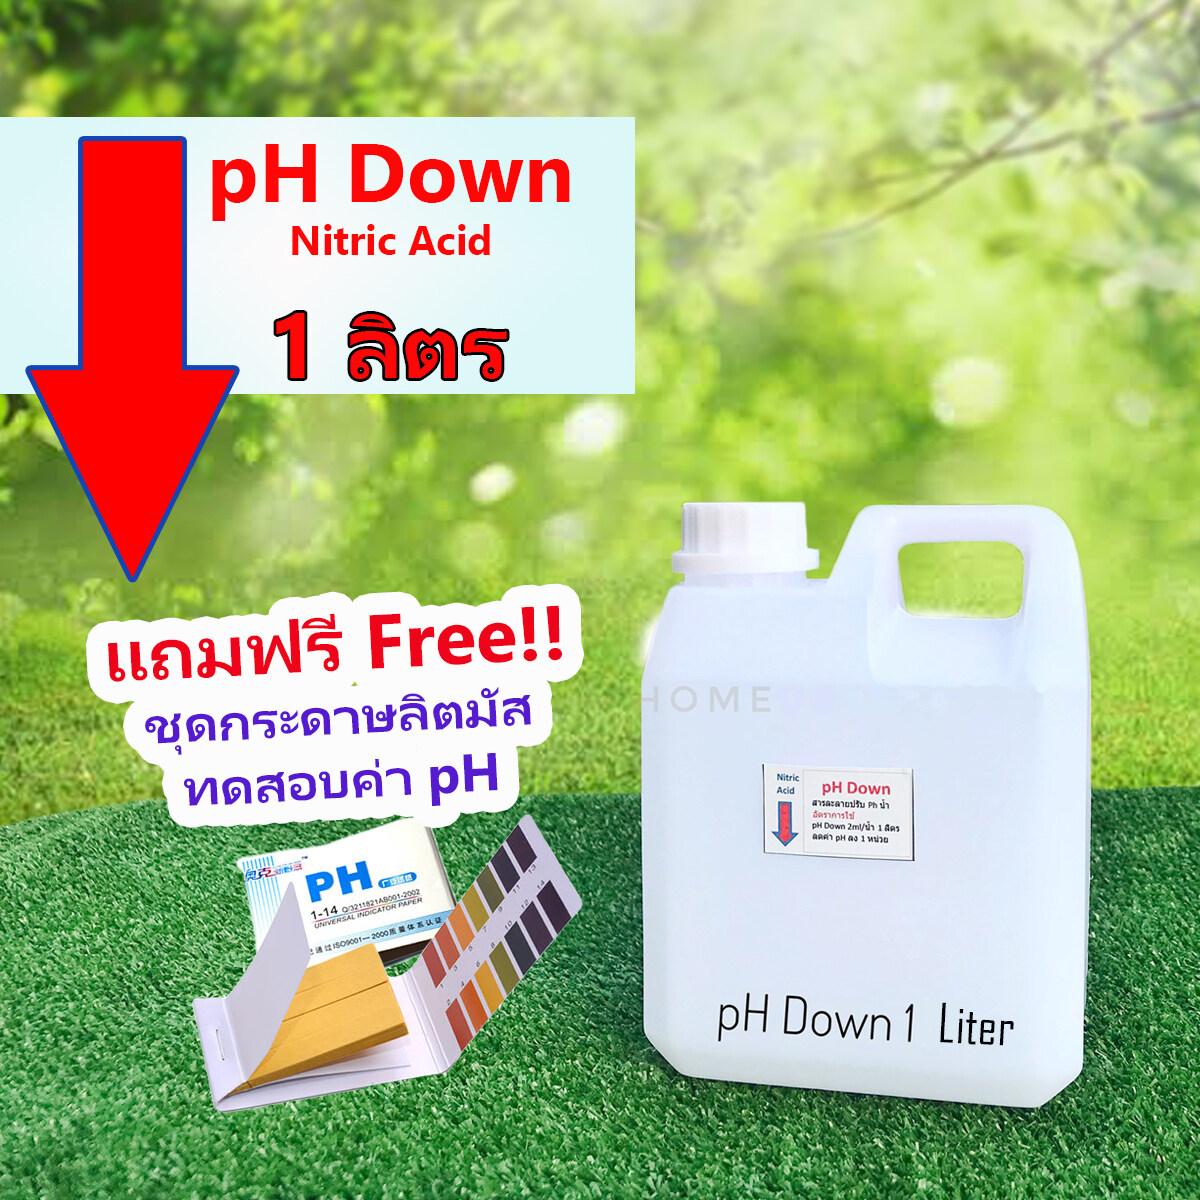 pH down น้ำยาลดค่าพีเอช แกลอน 1ลิตร แถมฟรีกระดาษลิตมัสวัดค่า pH 1เล่ม